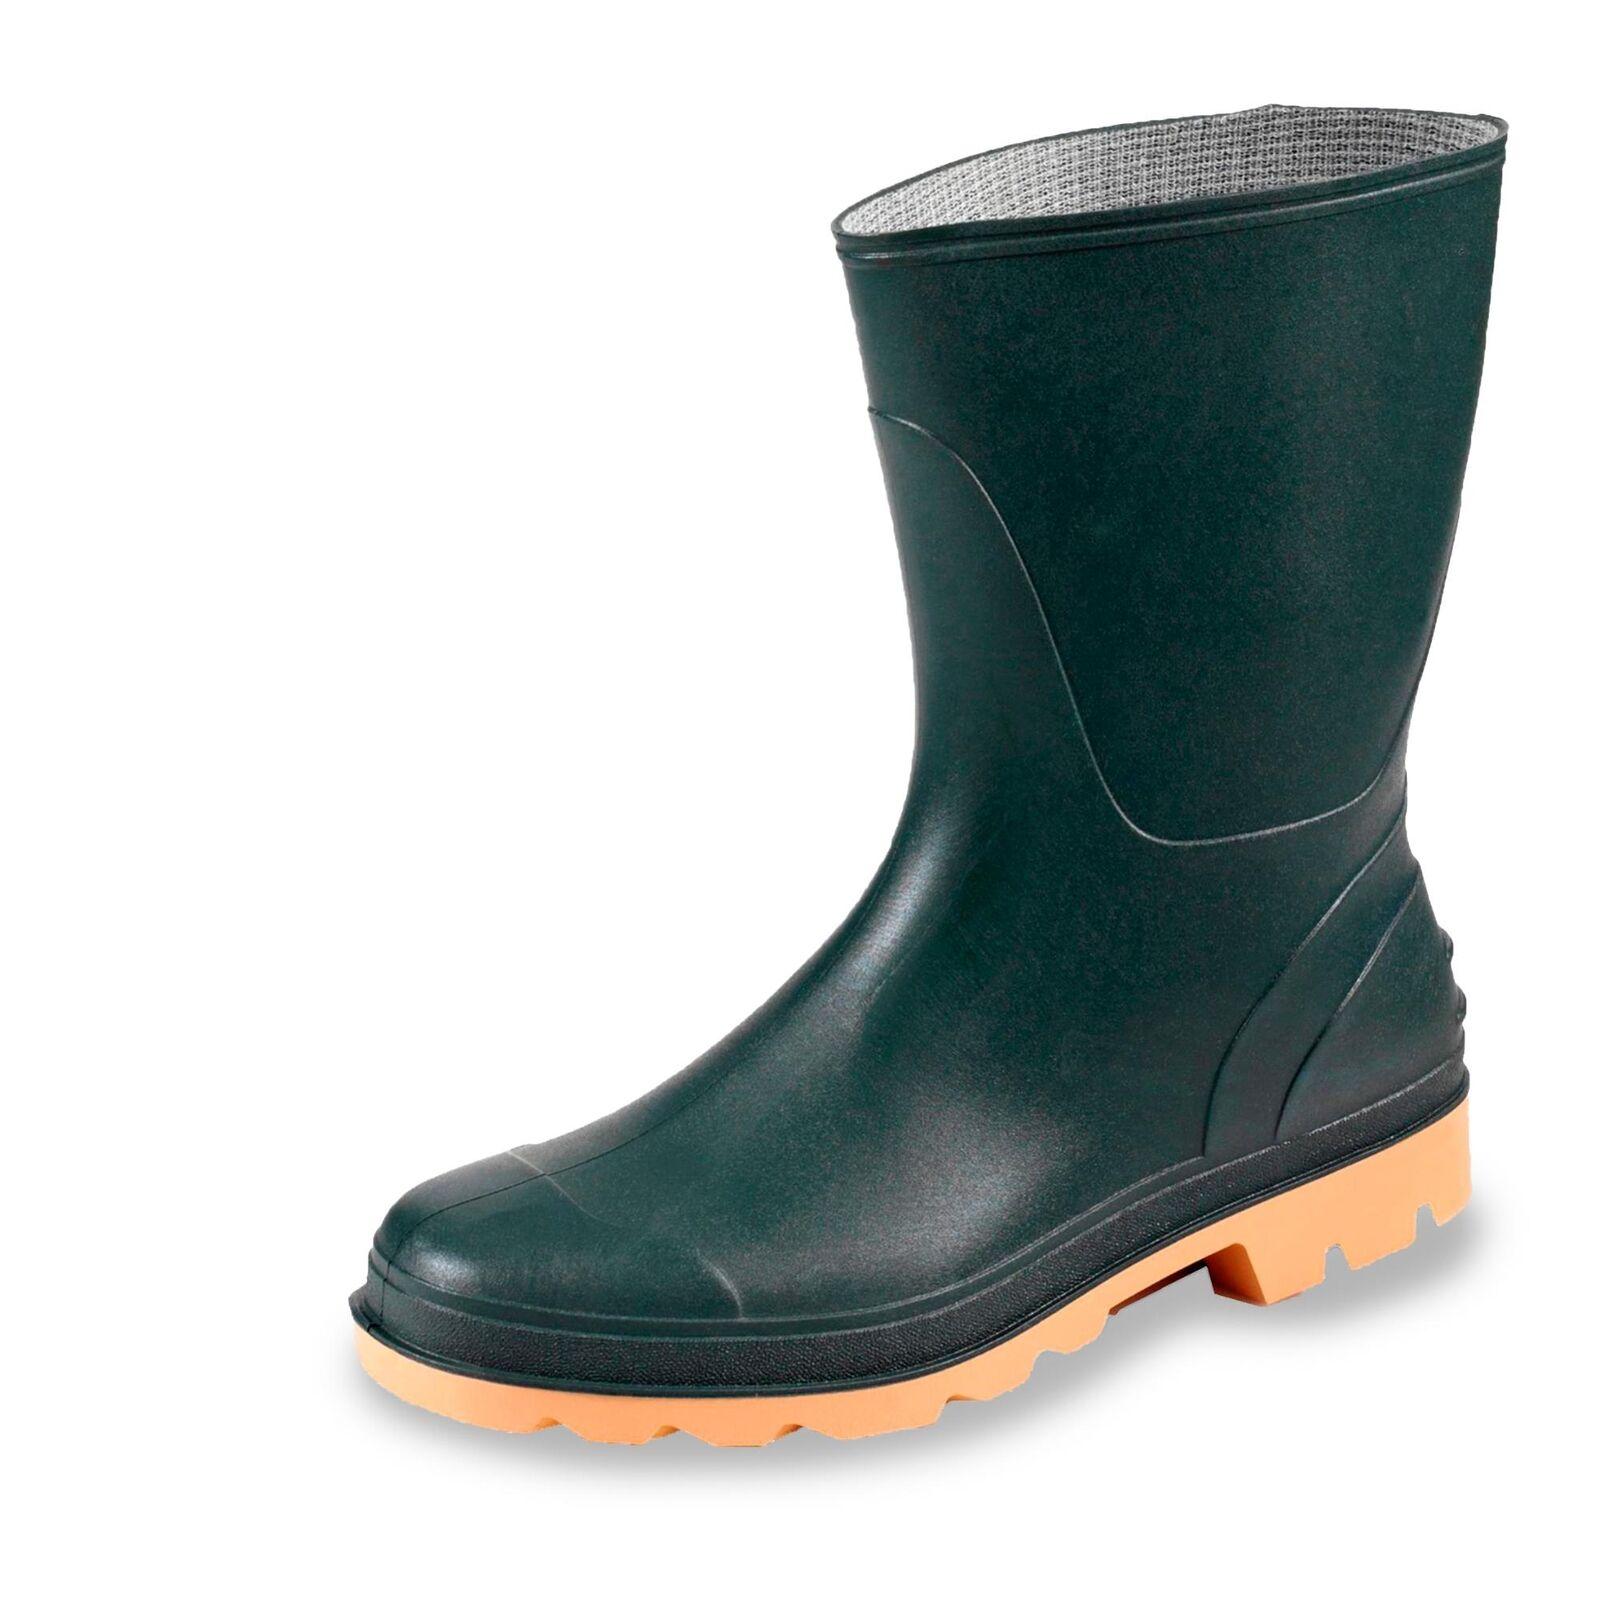 Naot Damen Schuhe Chelsea Boots günstig kaufen   CATCH by eBay